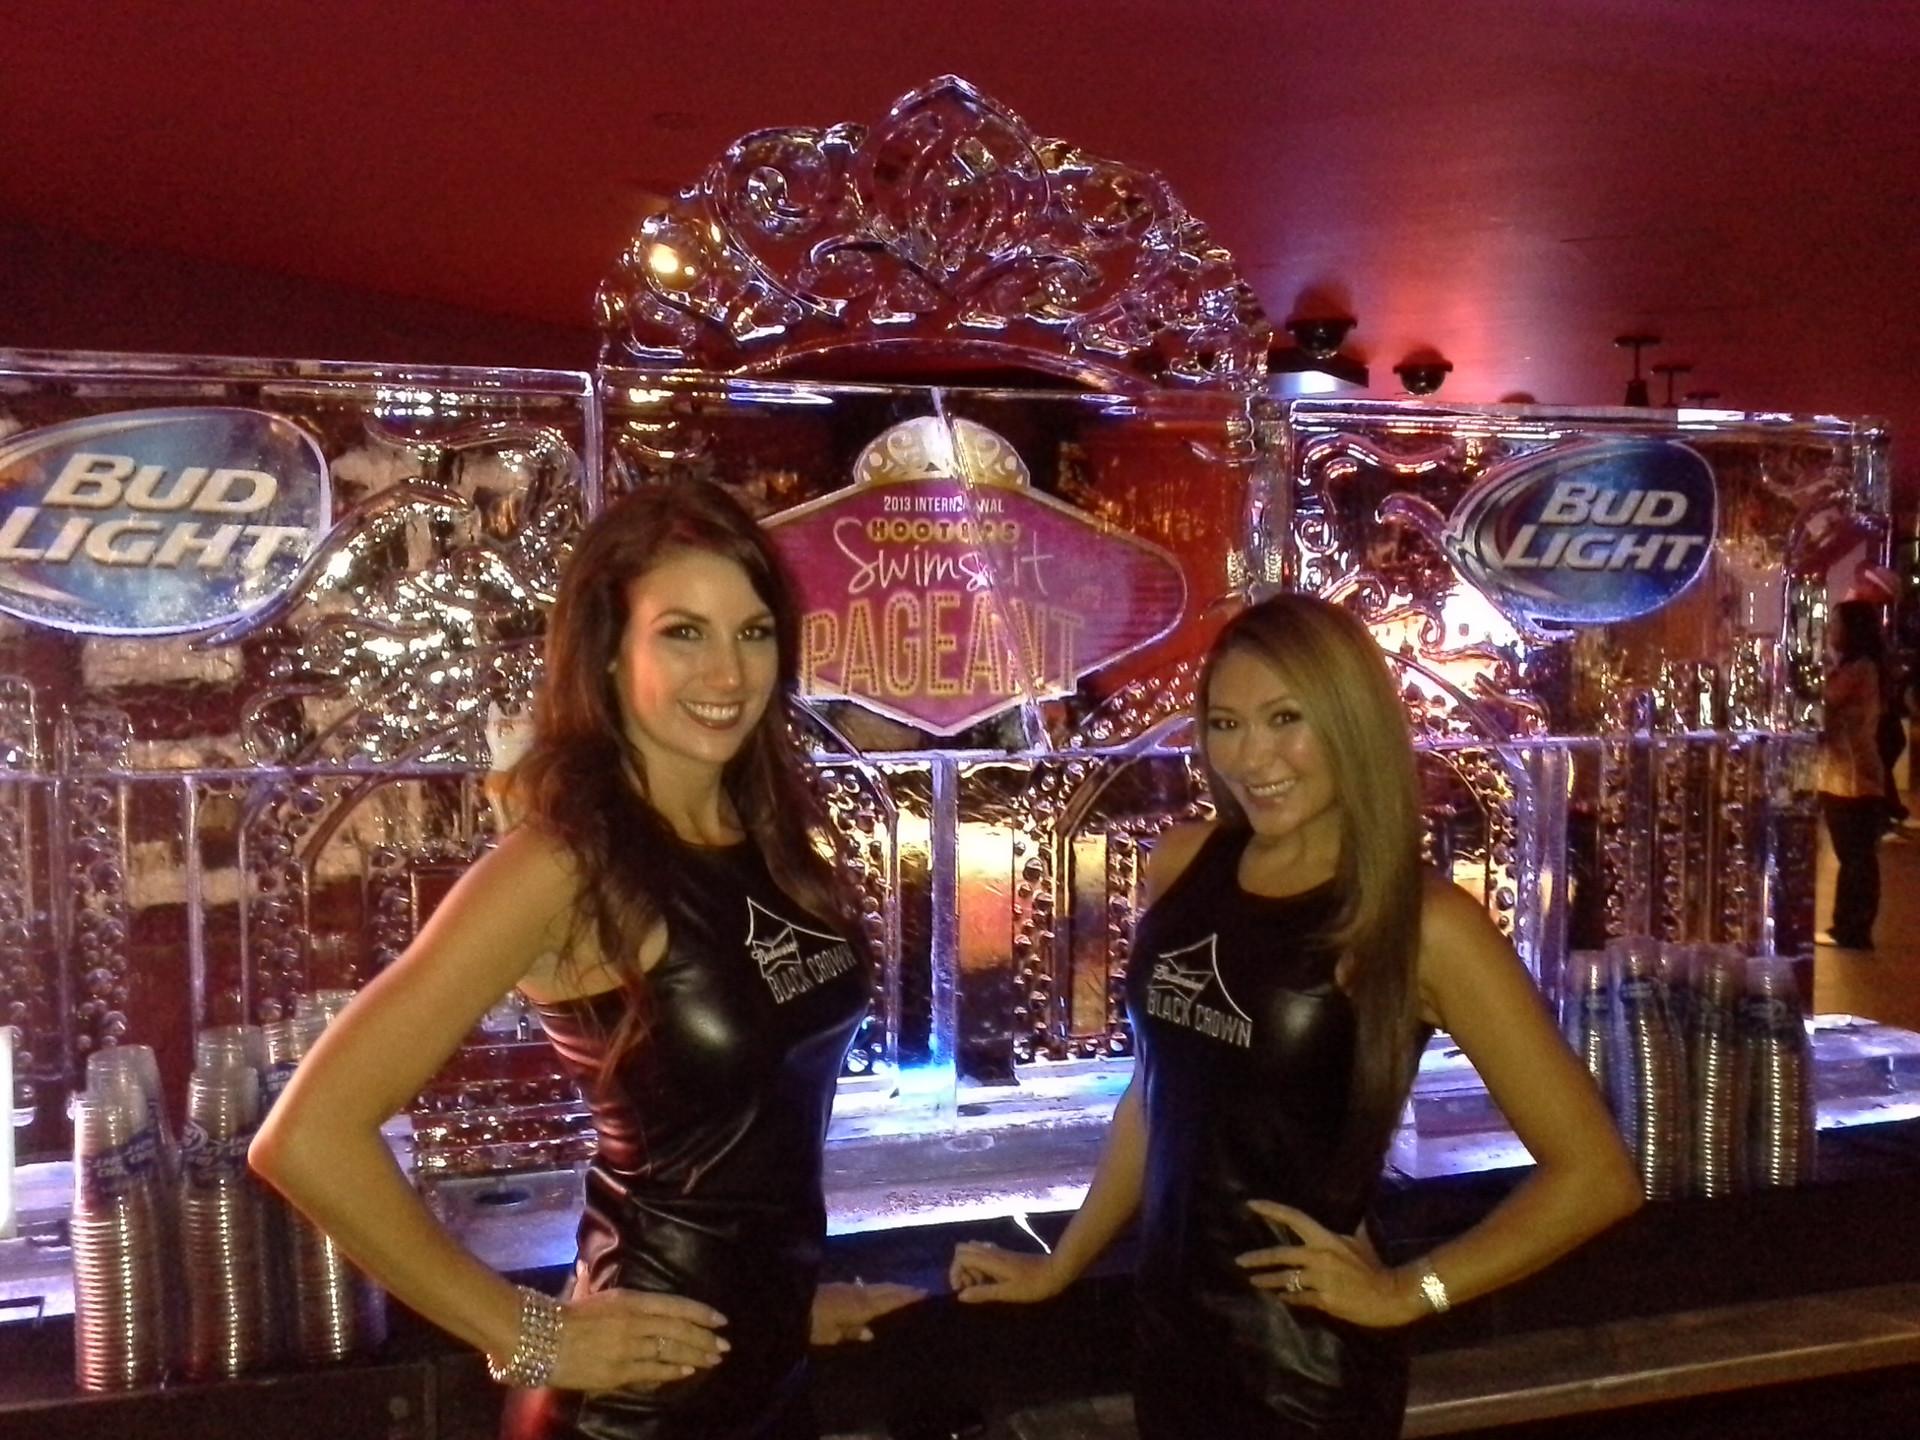 2 girls Beer Wall styled ice.jpg